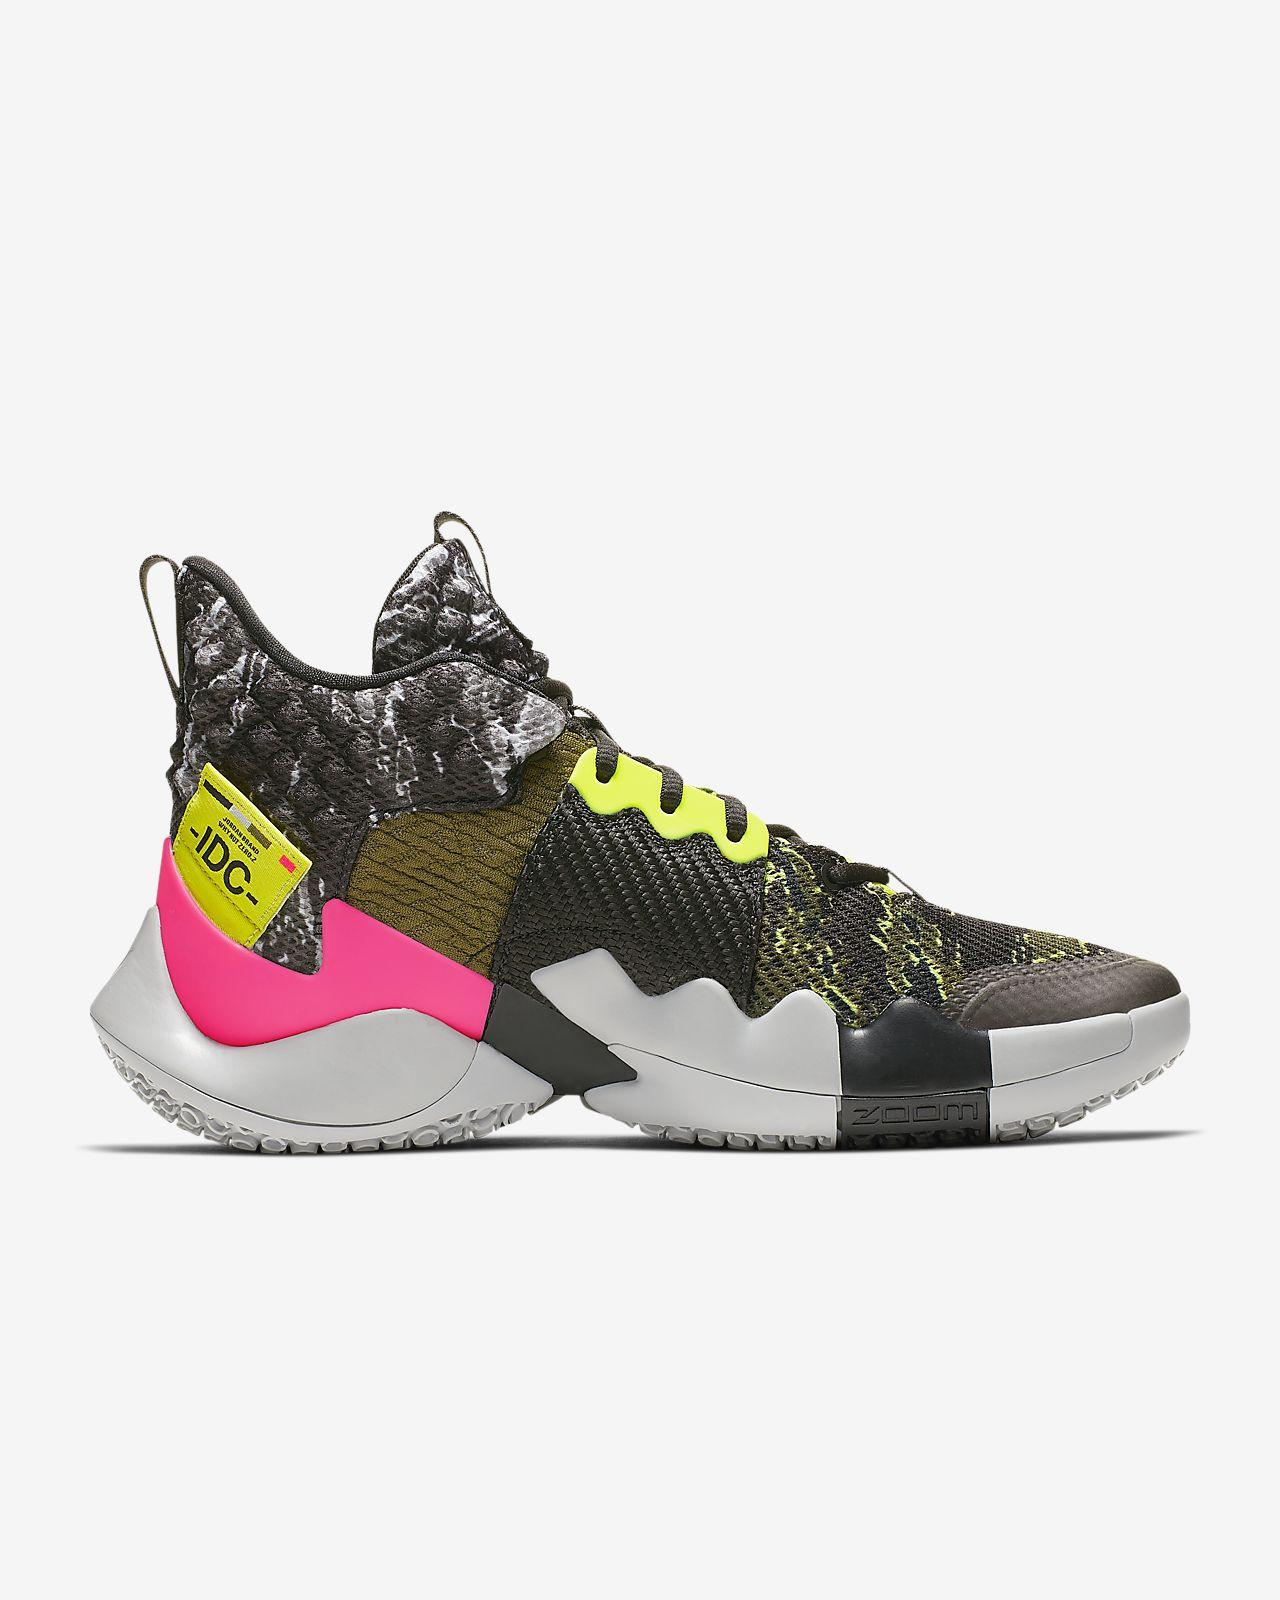 80ccd679892c Zer0.2 Basketball Shoe Jordan